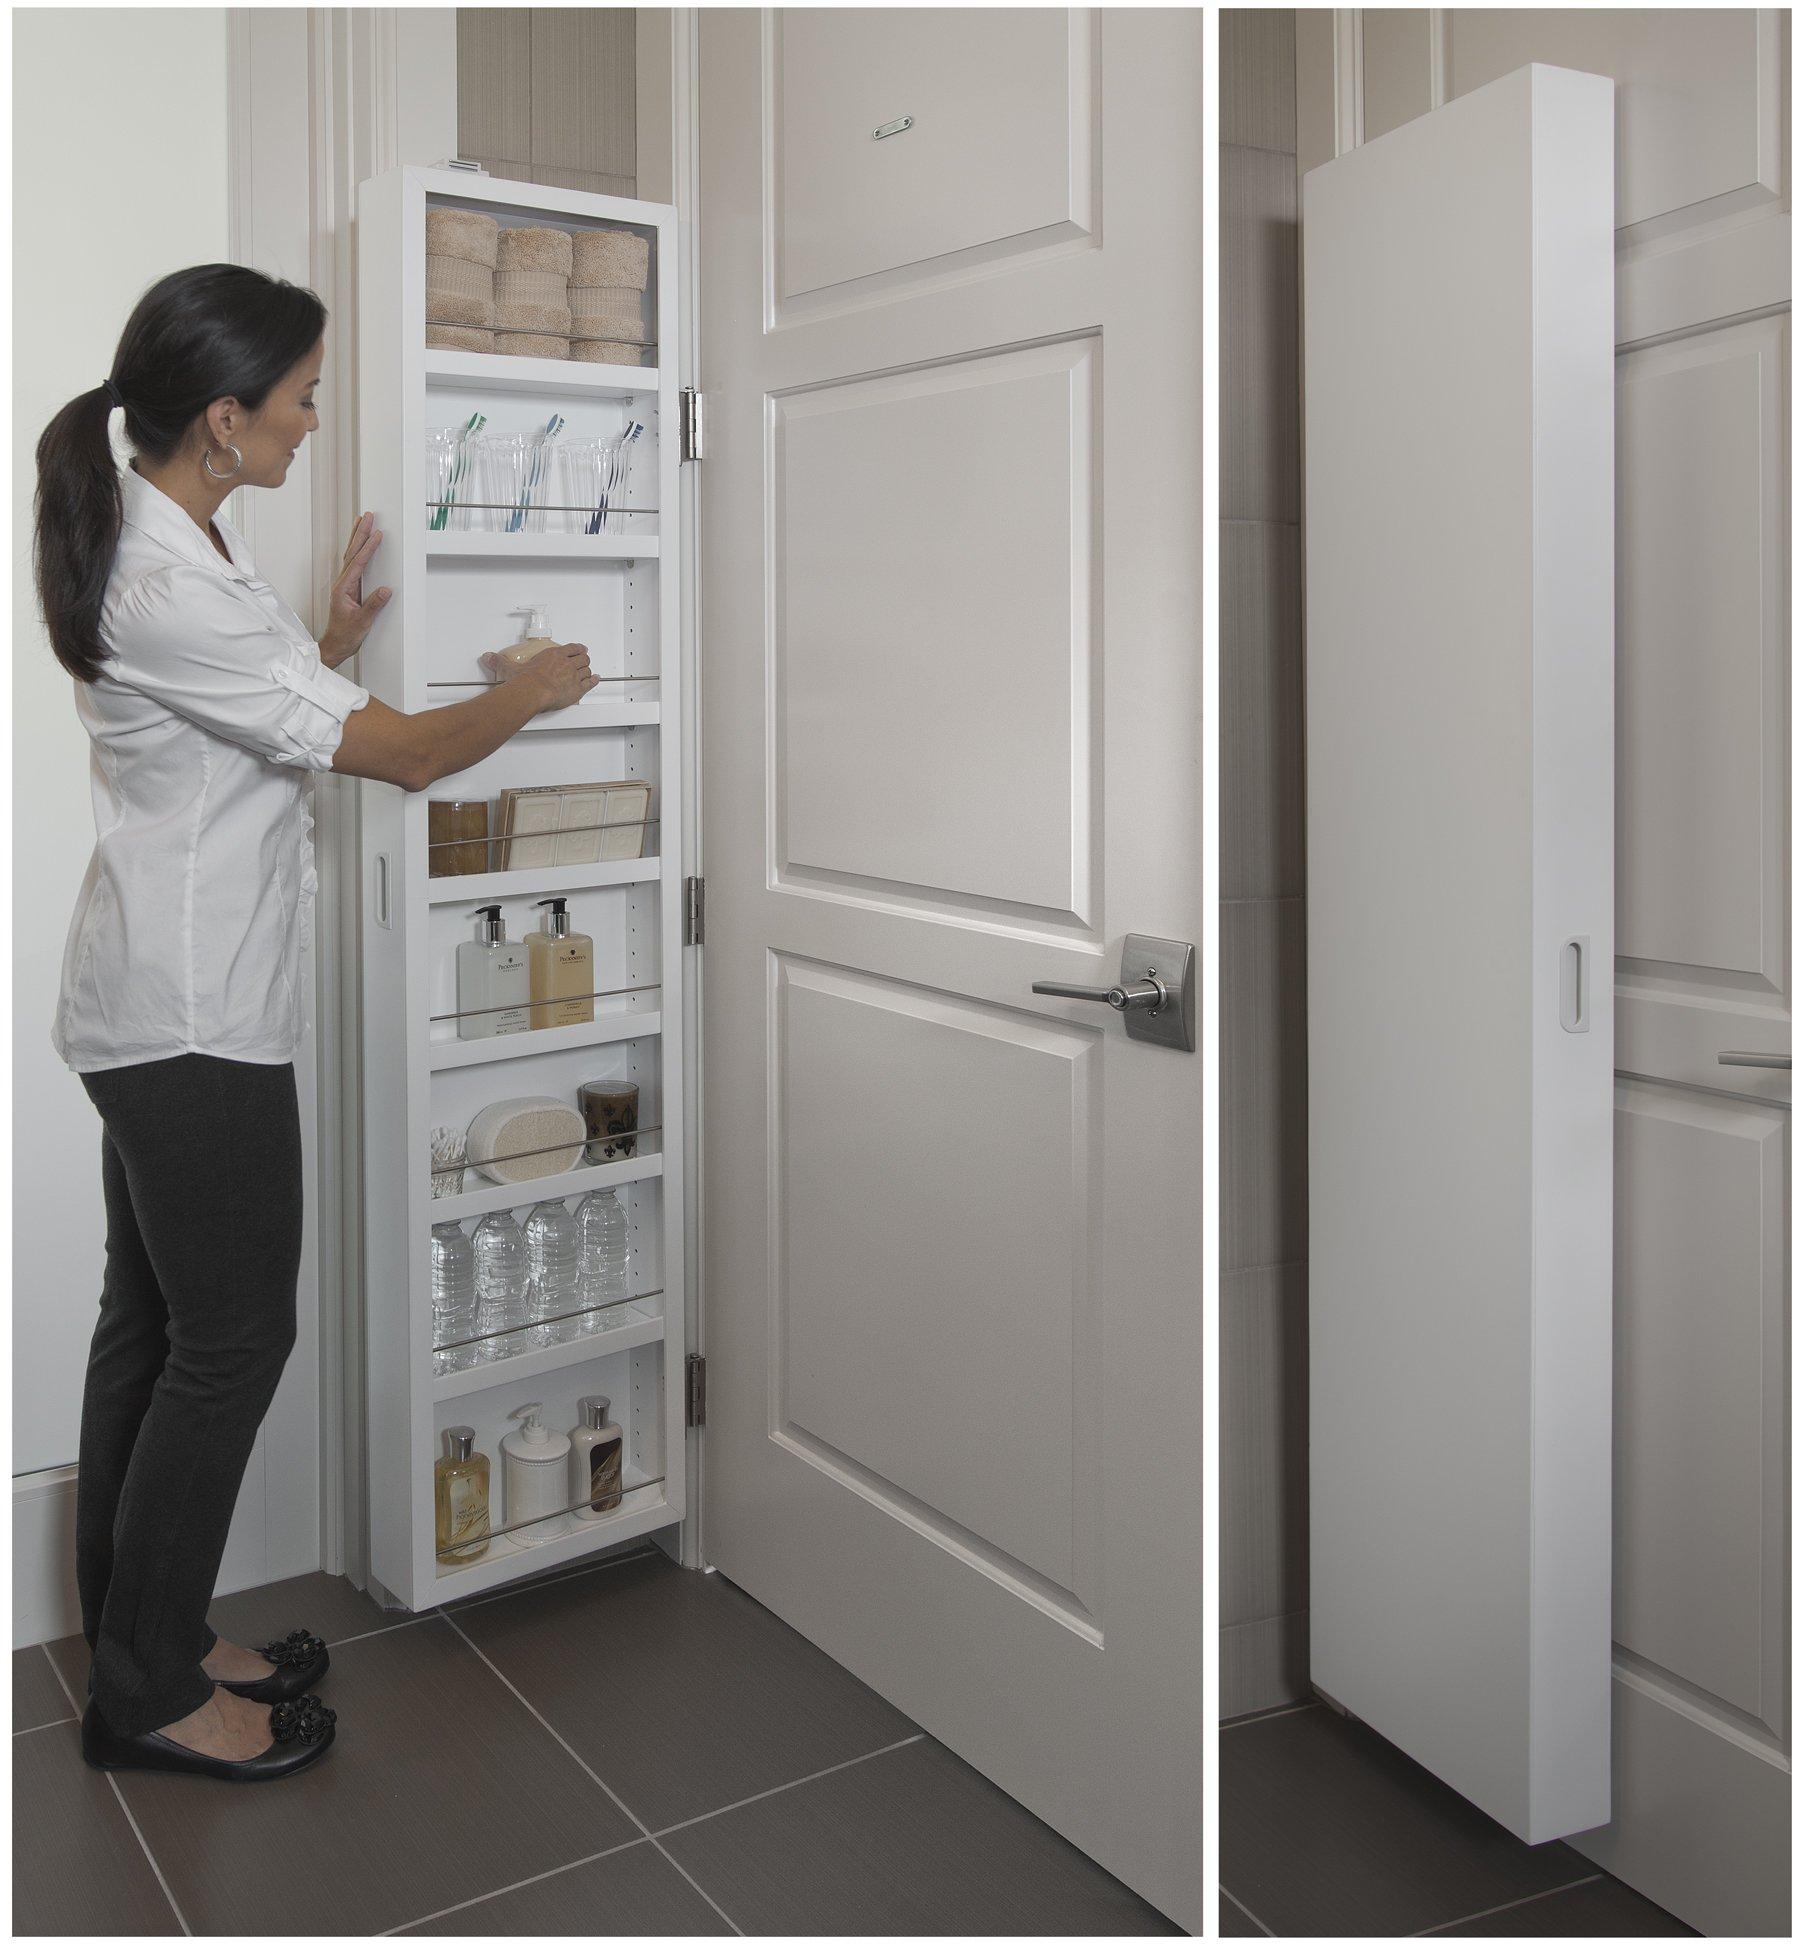 Cabidor Classic | Behind The Door | customizable | Medicine, Bathroom, Kitchen Storage Cabinet by Cabidor